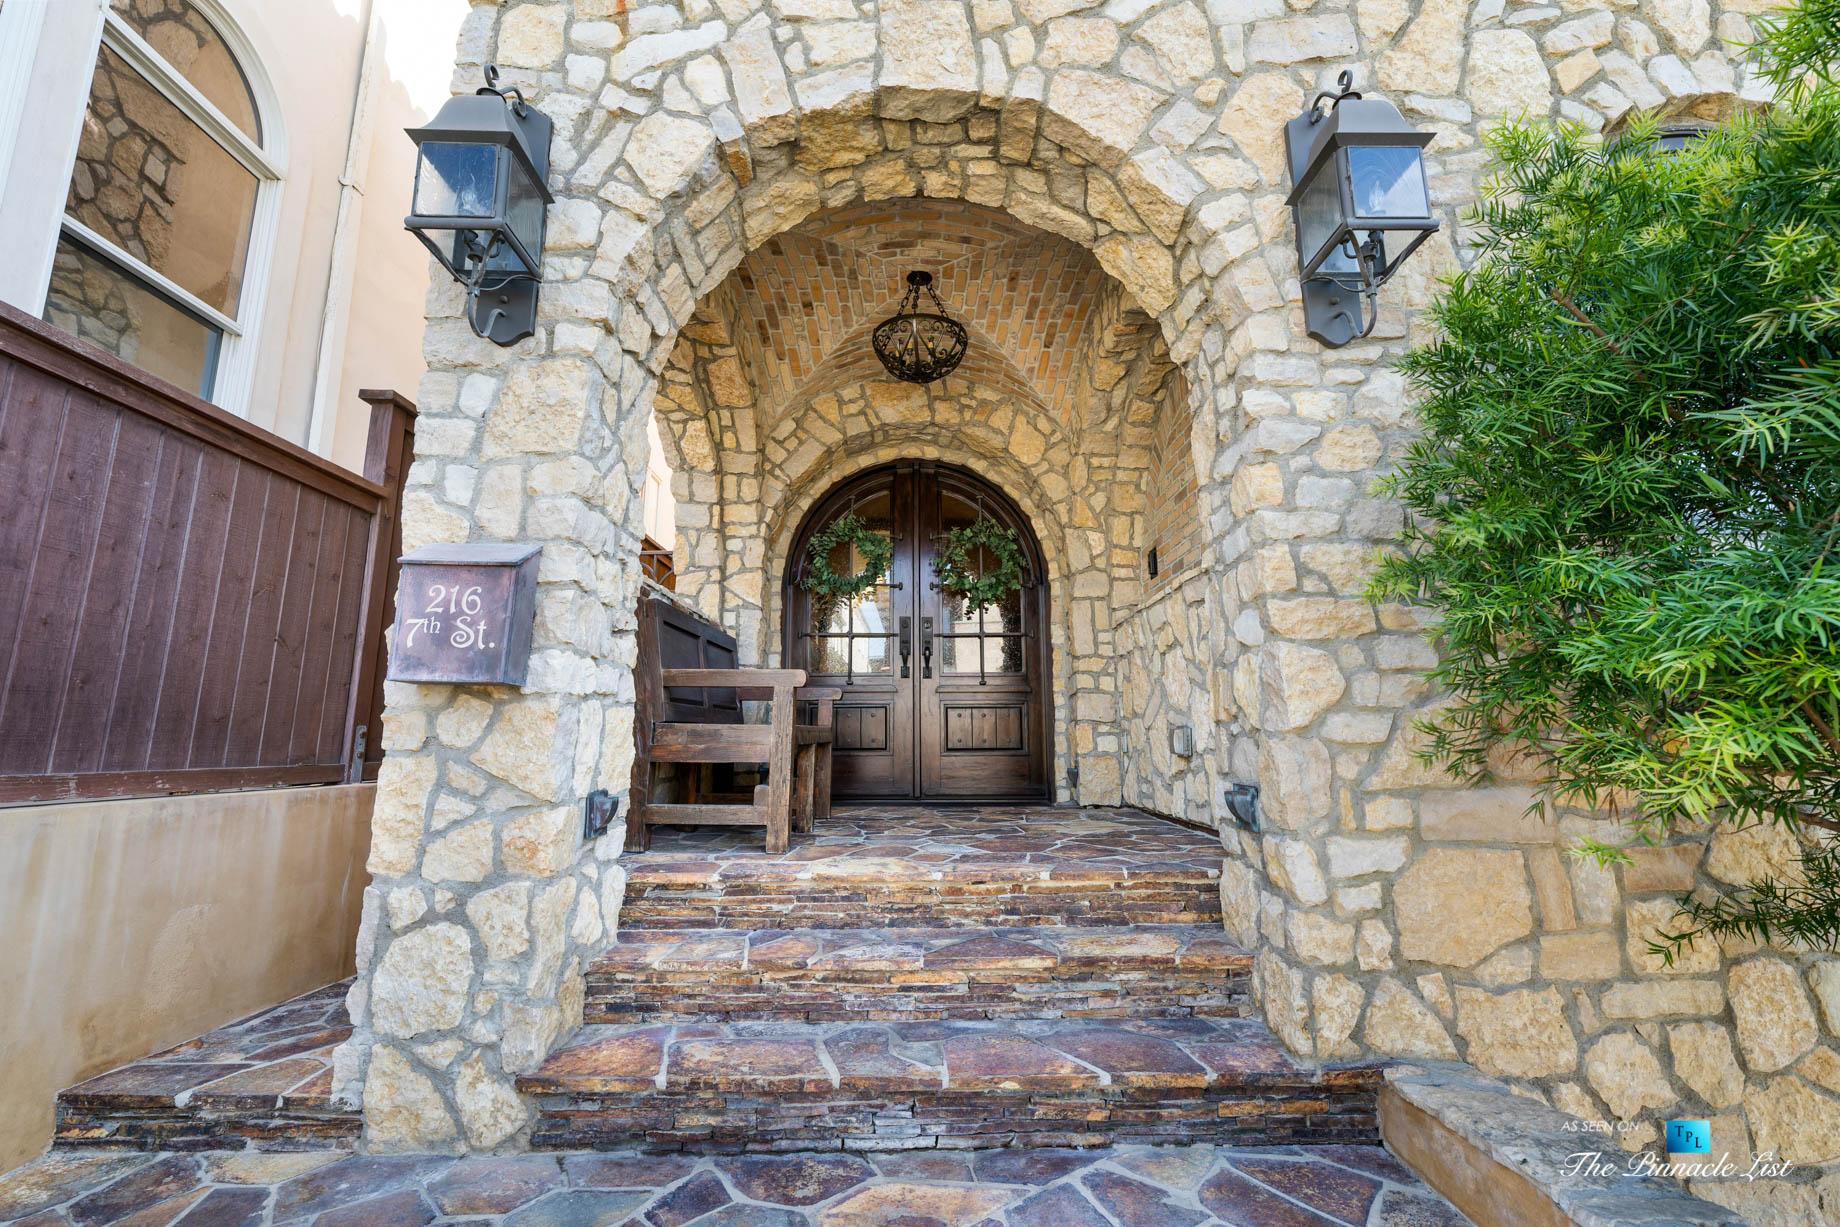 216 7th St, Manhattan Beach, CA, USA – Luxury Real Estate – Coastal Villa Home – Front Door Porch